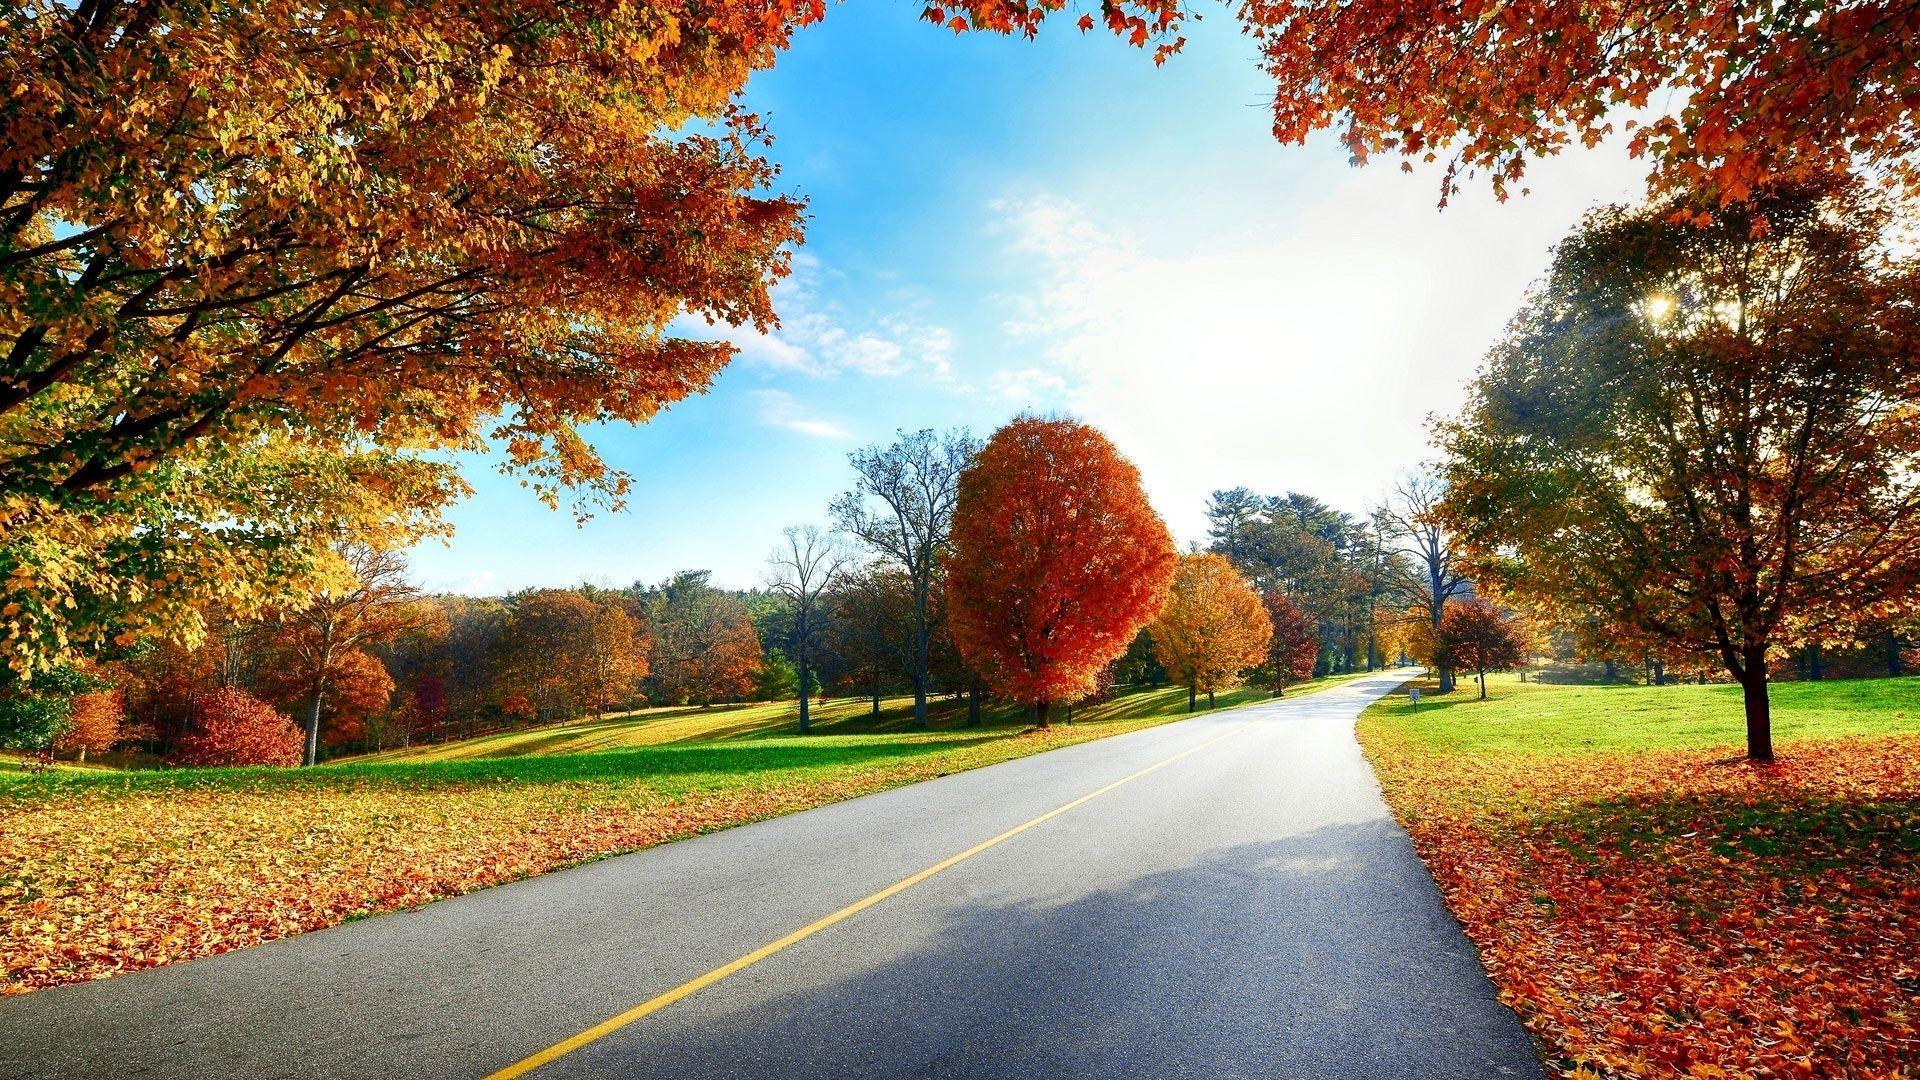 Beautiful autumn road scenery wallpapers – Free full hd wallpapers .